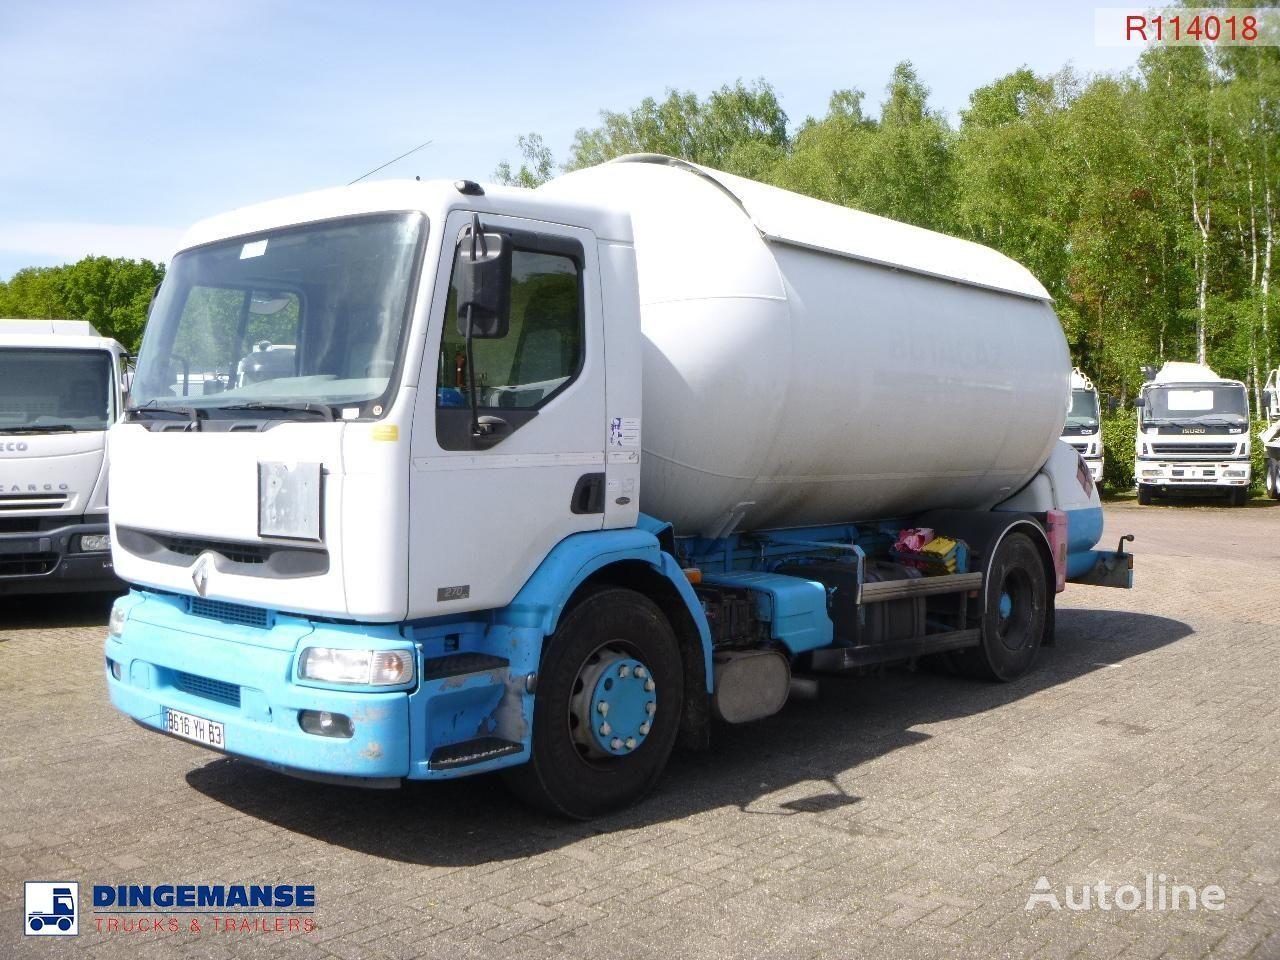 RENAULT Premium 270.19 4x2 gas tank 19.7 m3 Gastransporter LKW